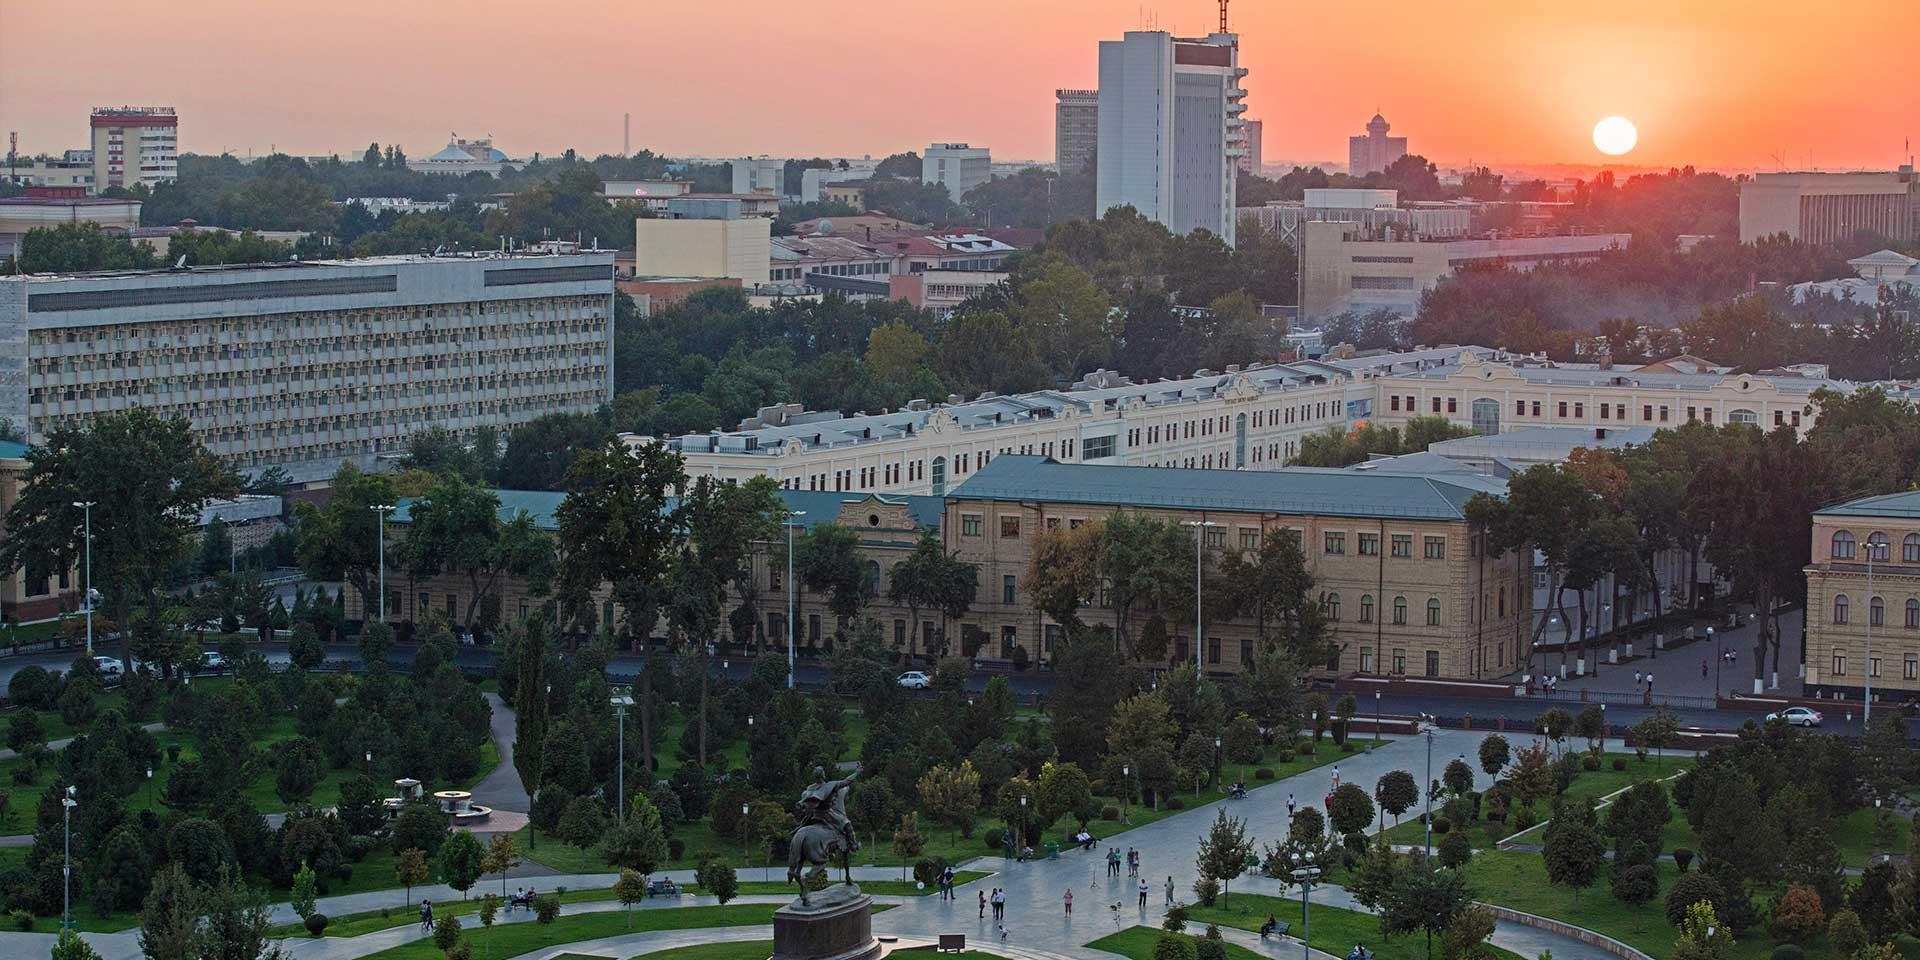 Tashkent tablet image